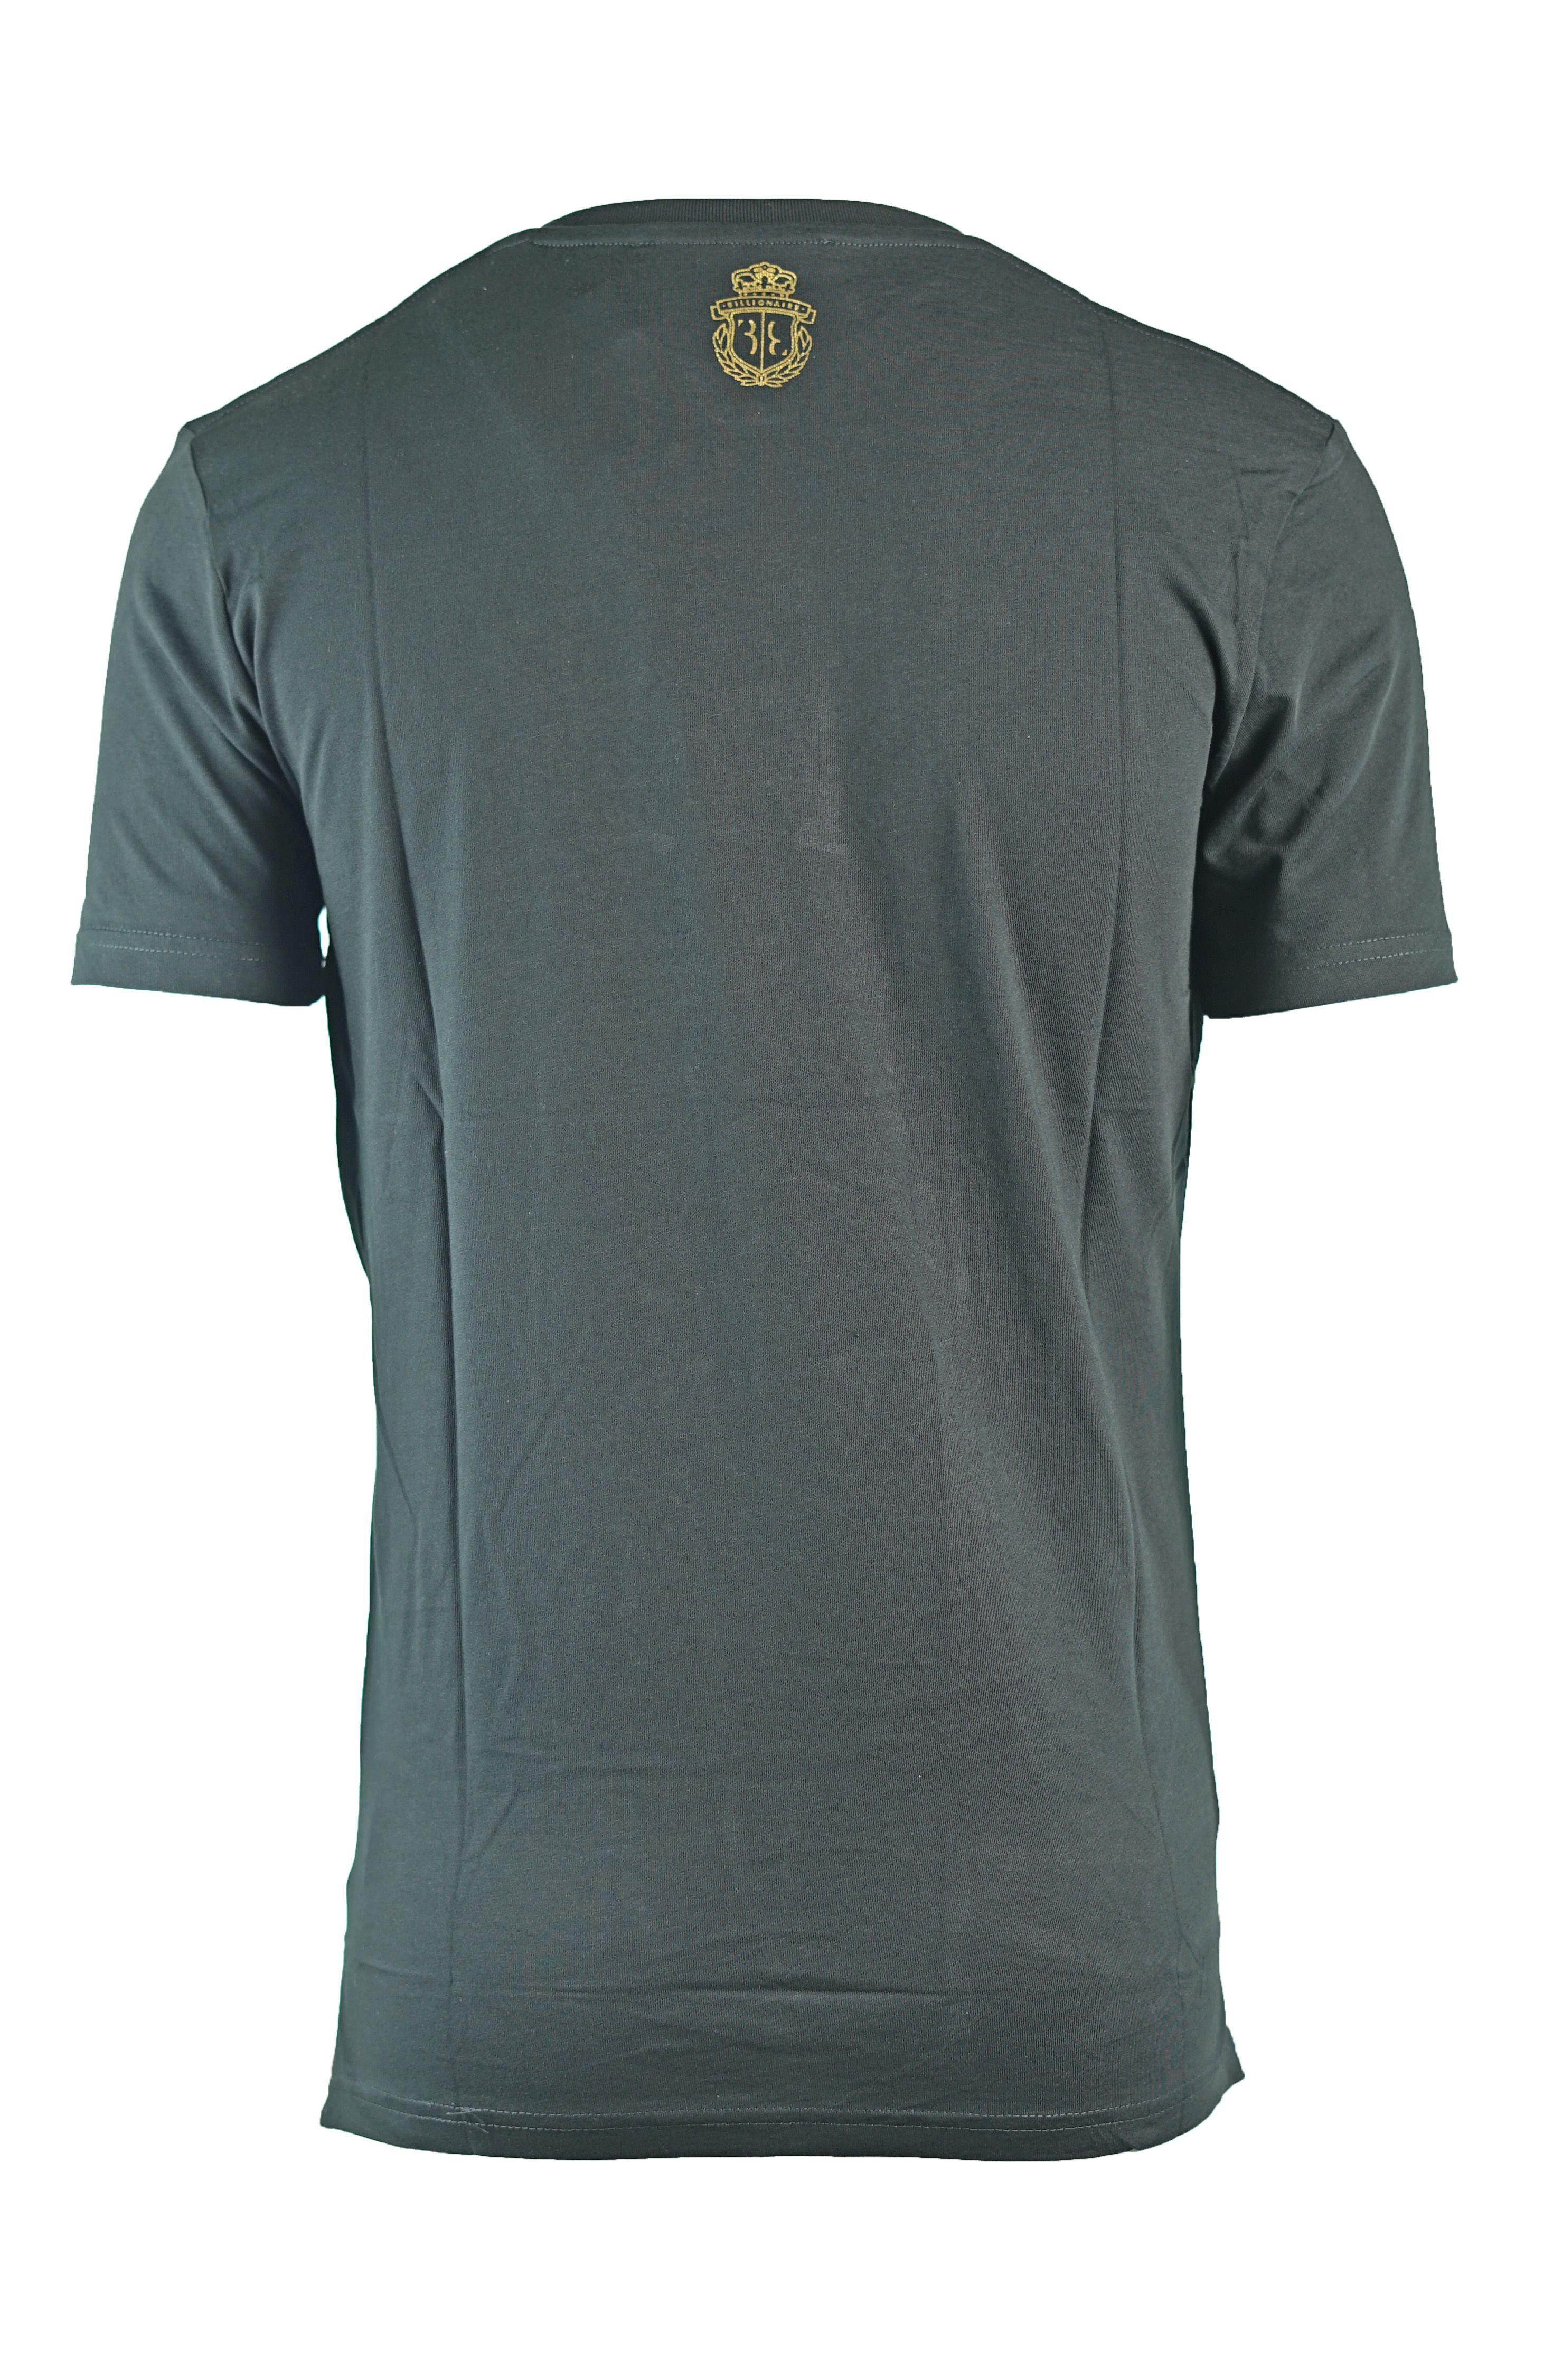 "Billionaire ""10"" MTK0429 X999 Black T-Shirt"